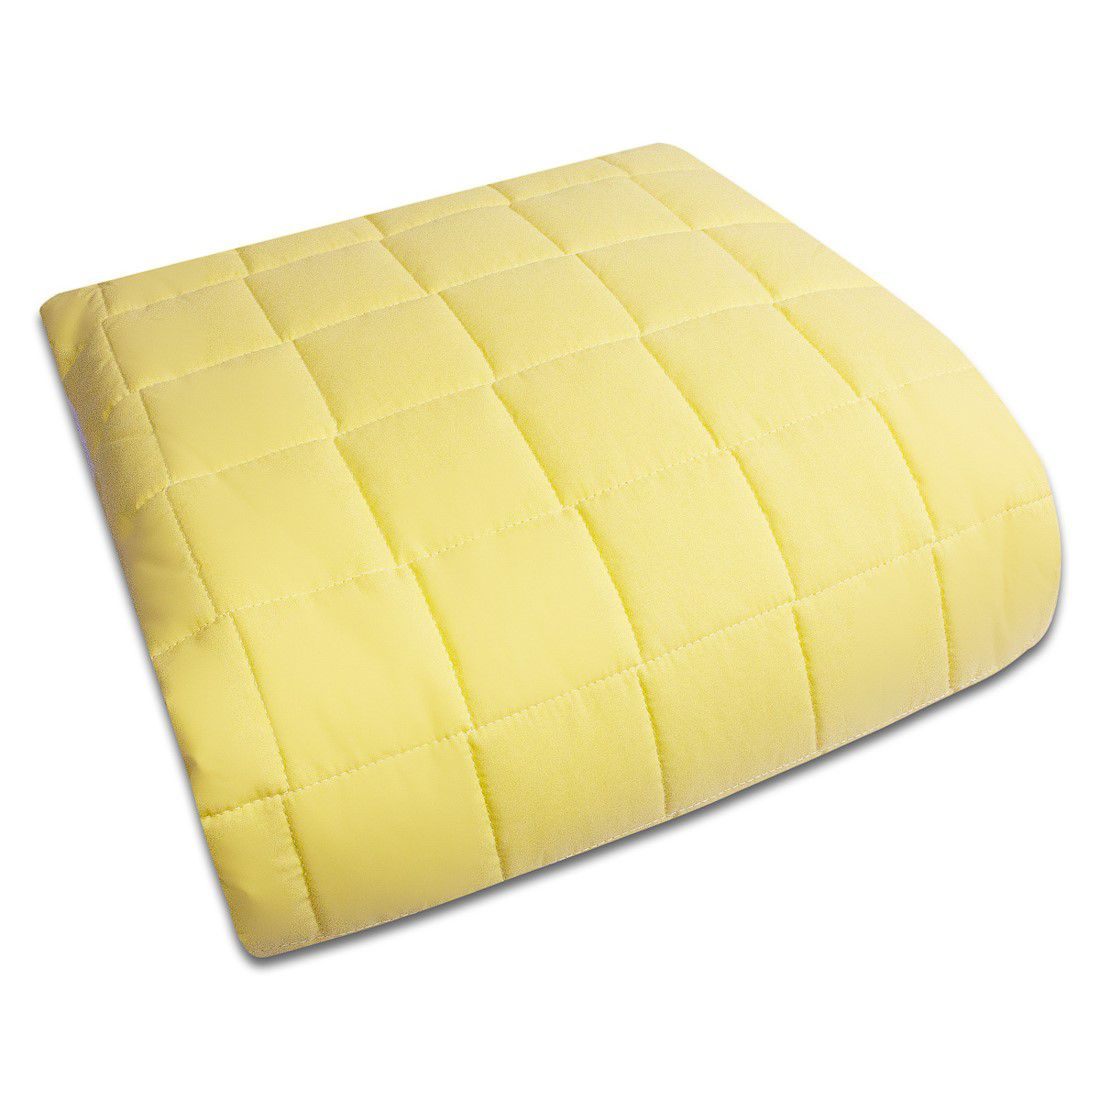 Colcha Com Elástico Percal 200 Fios Cubos amarelo Claro